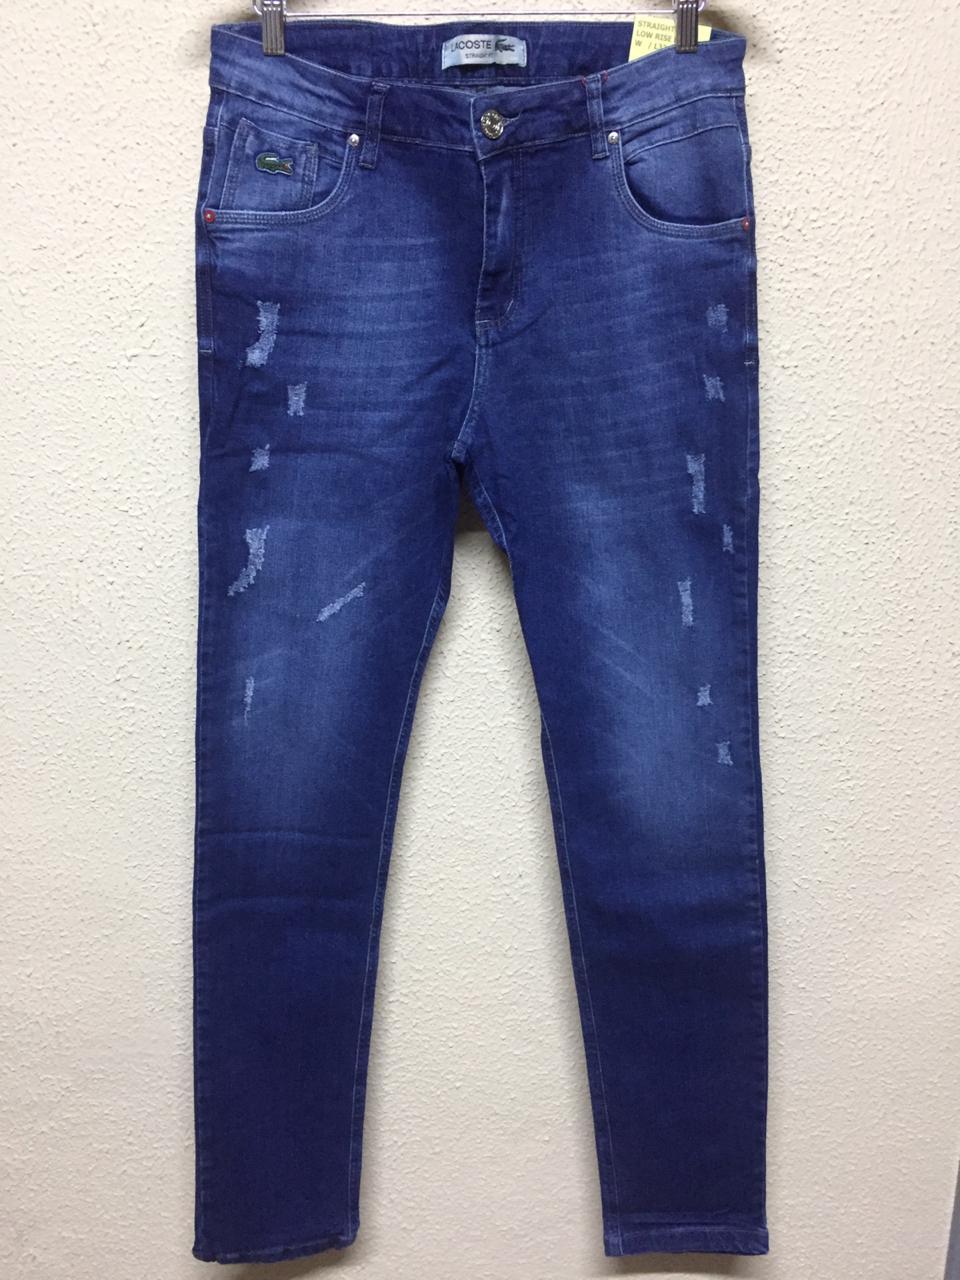 Calça Lacoste Masculina Jeans